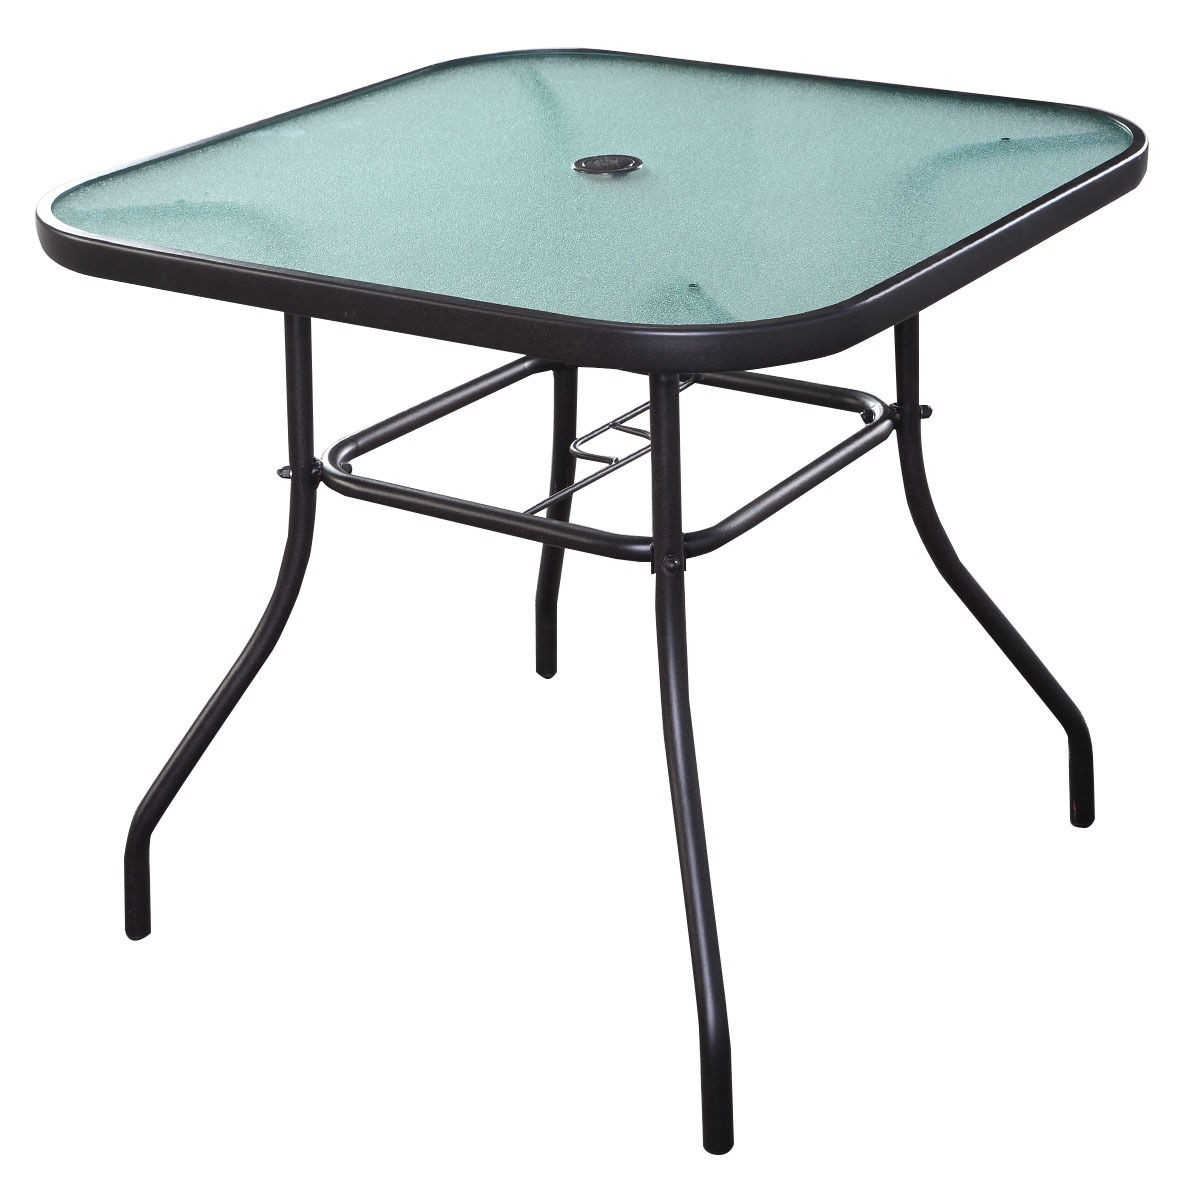 32 1 2 patio square bar dining table glass deck garden pool outdoor furniture ebay. Black Bedroom Furniture Sets. Home Design Ideas